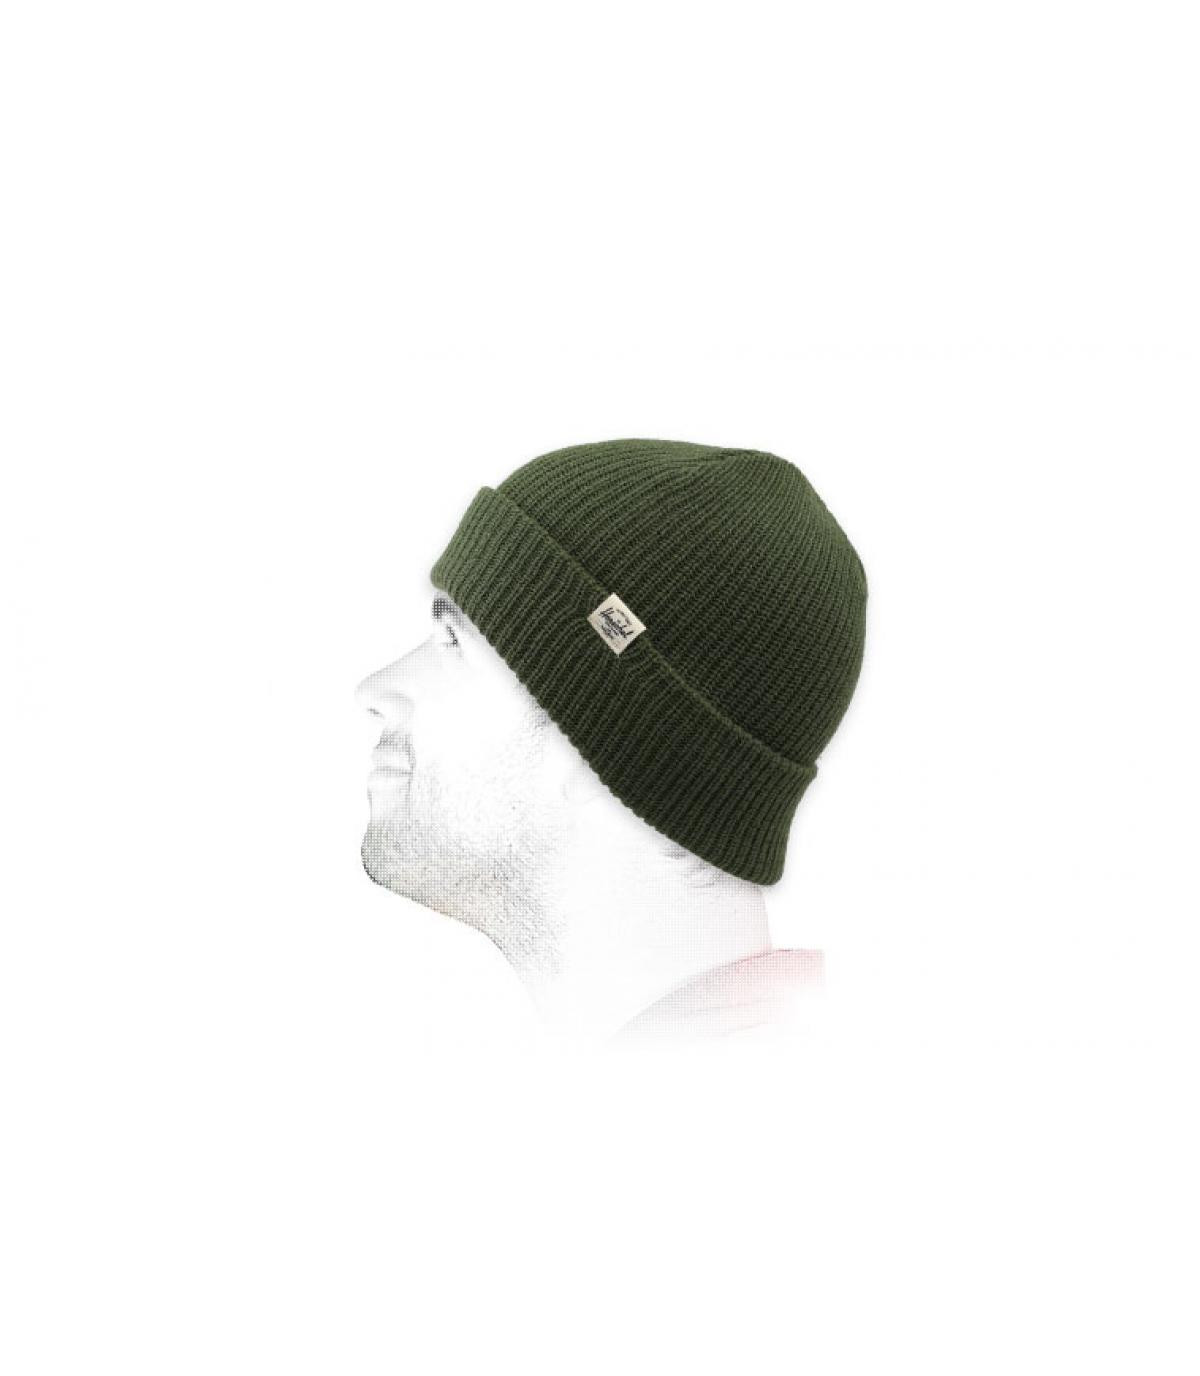 bonnet revers Herchel vert